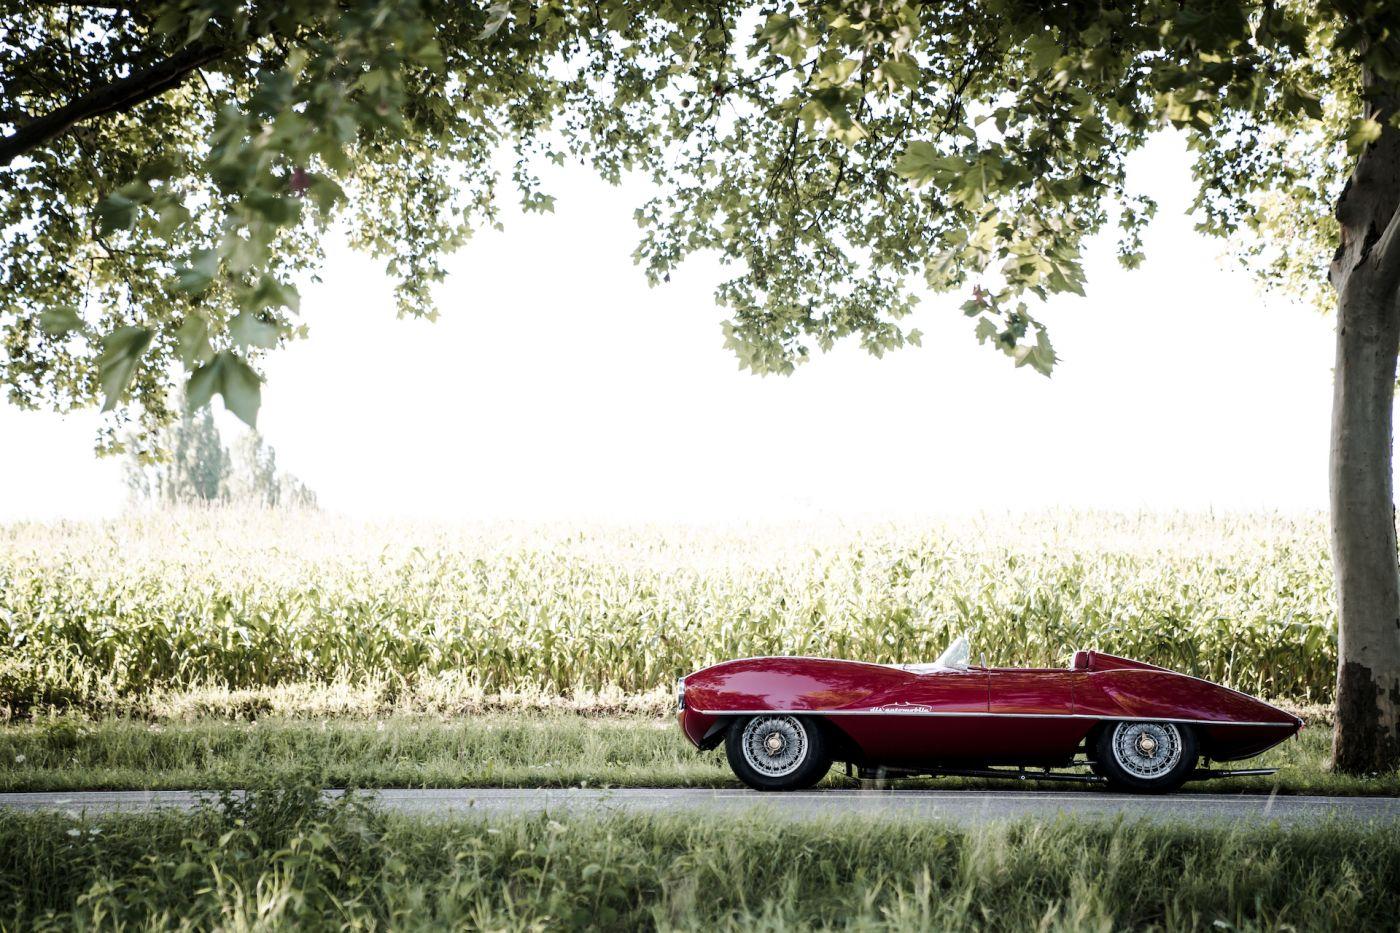 Alfa Romeo Disco Volante DLS_(c)_Kirill_Kirsanov (2)